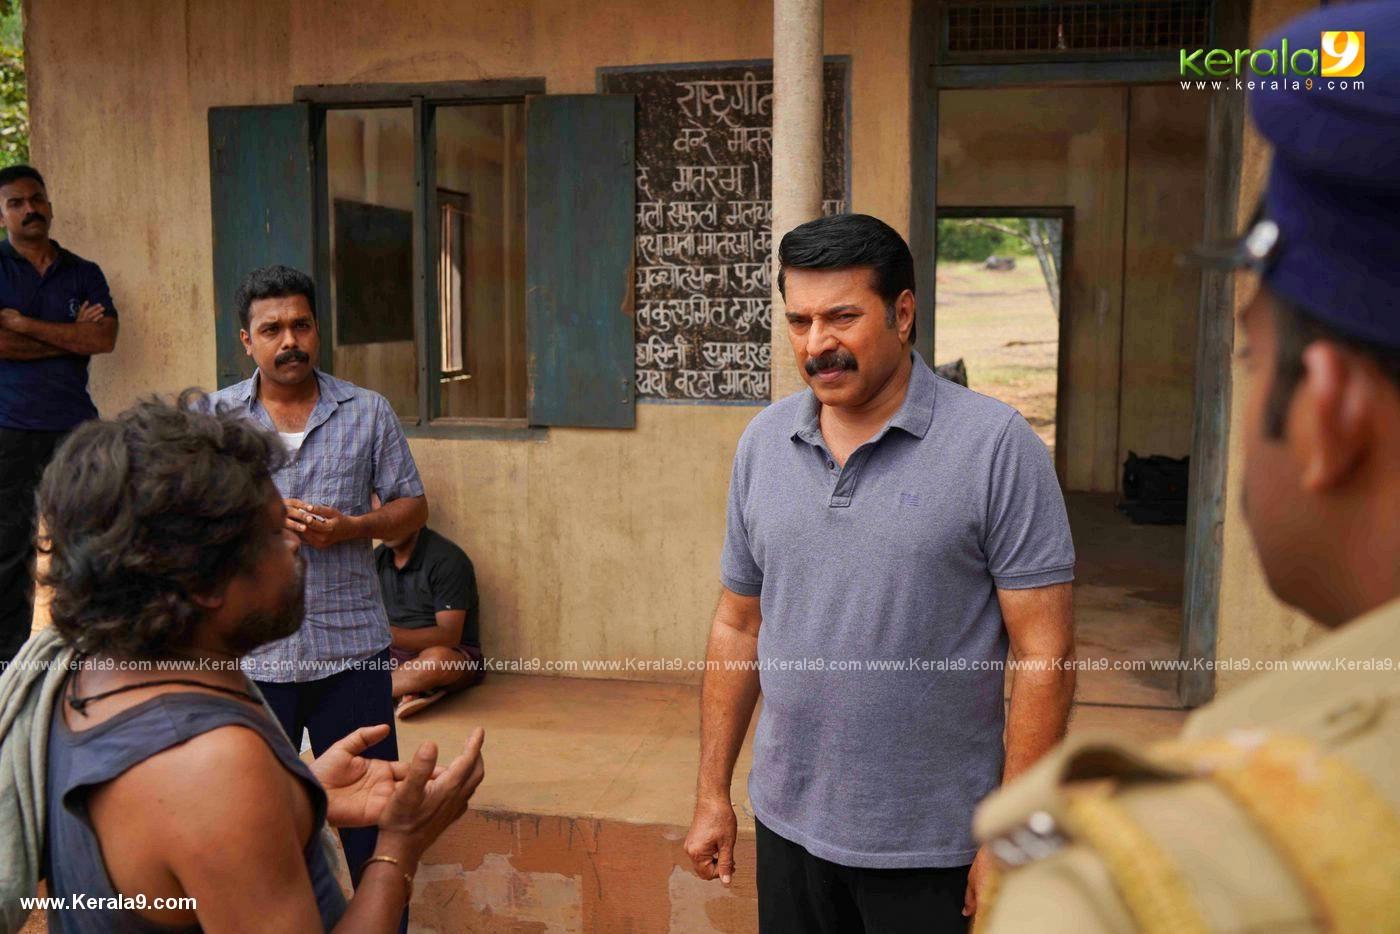 mammootty in unda movie photos - Kerala9.com